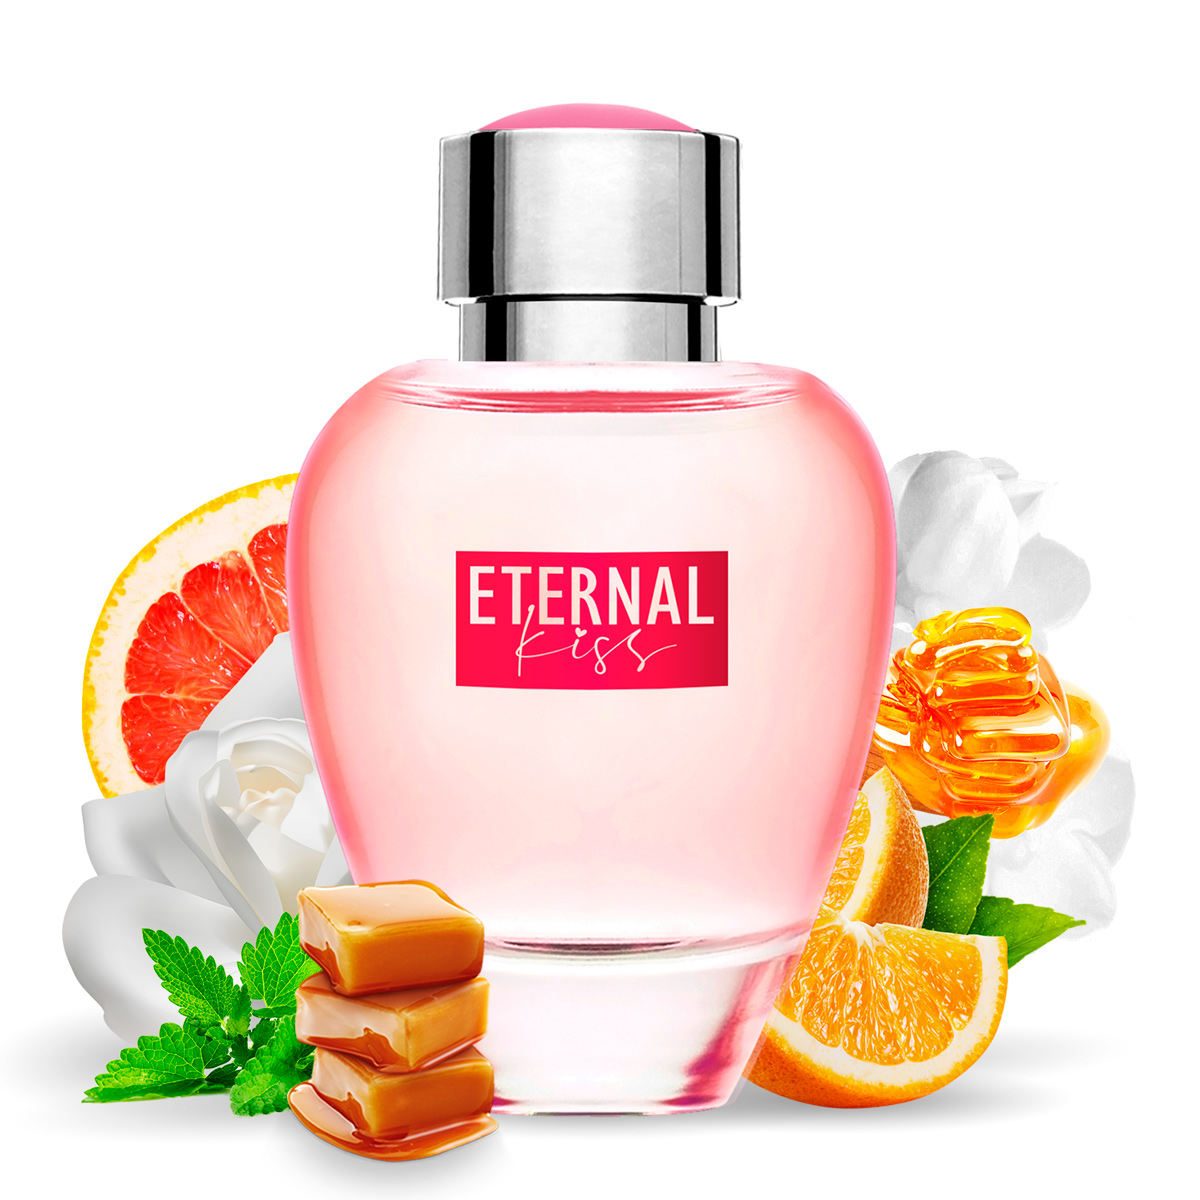 Kit 2 Perfumes Importados In Flames e Eternal Kiss La Rive  - Mercari Perfumes